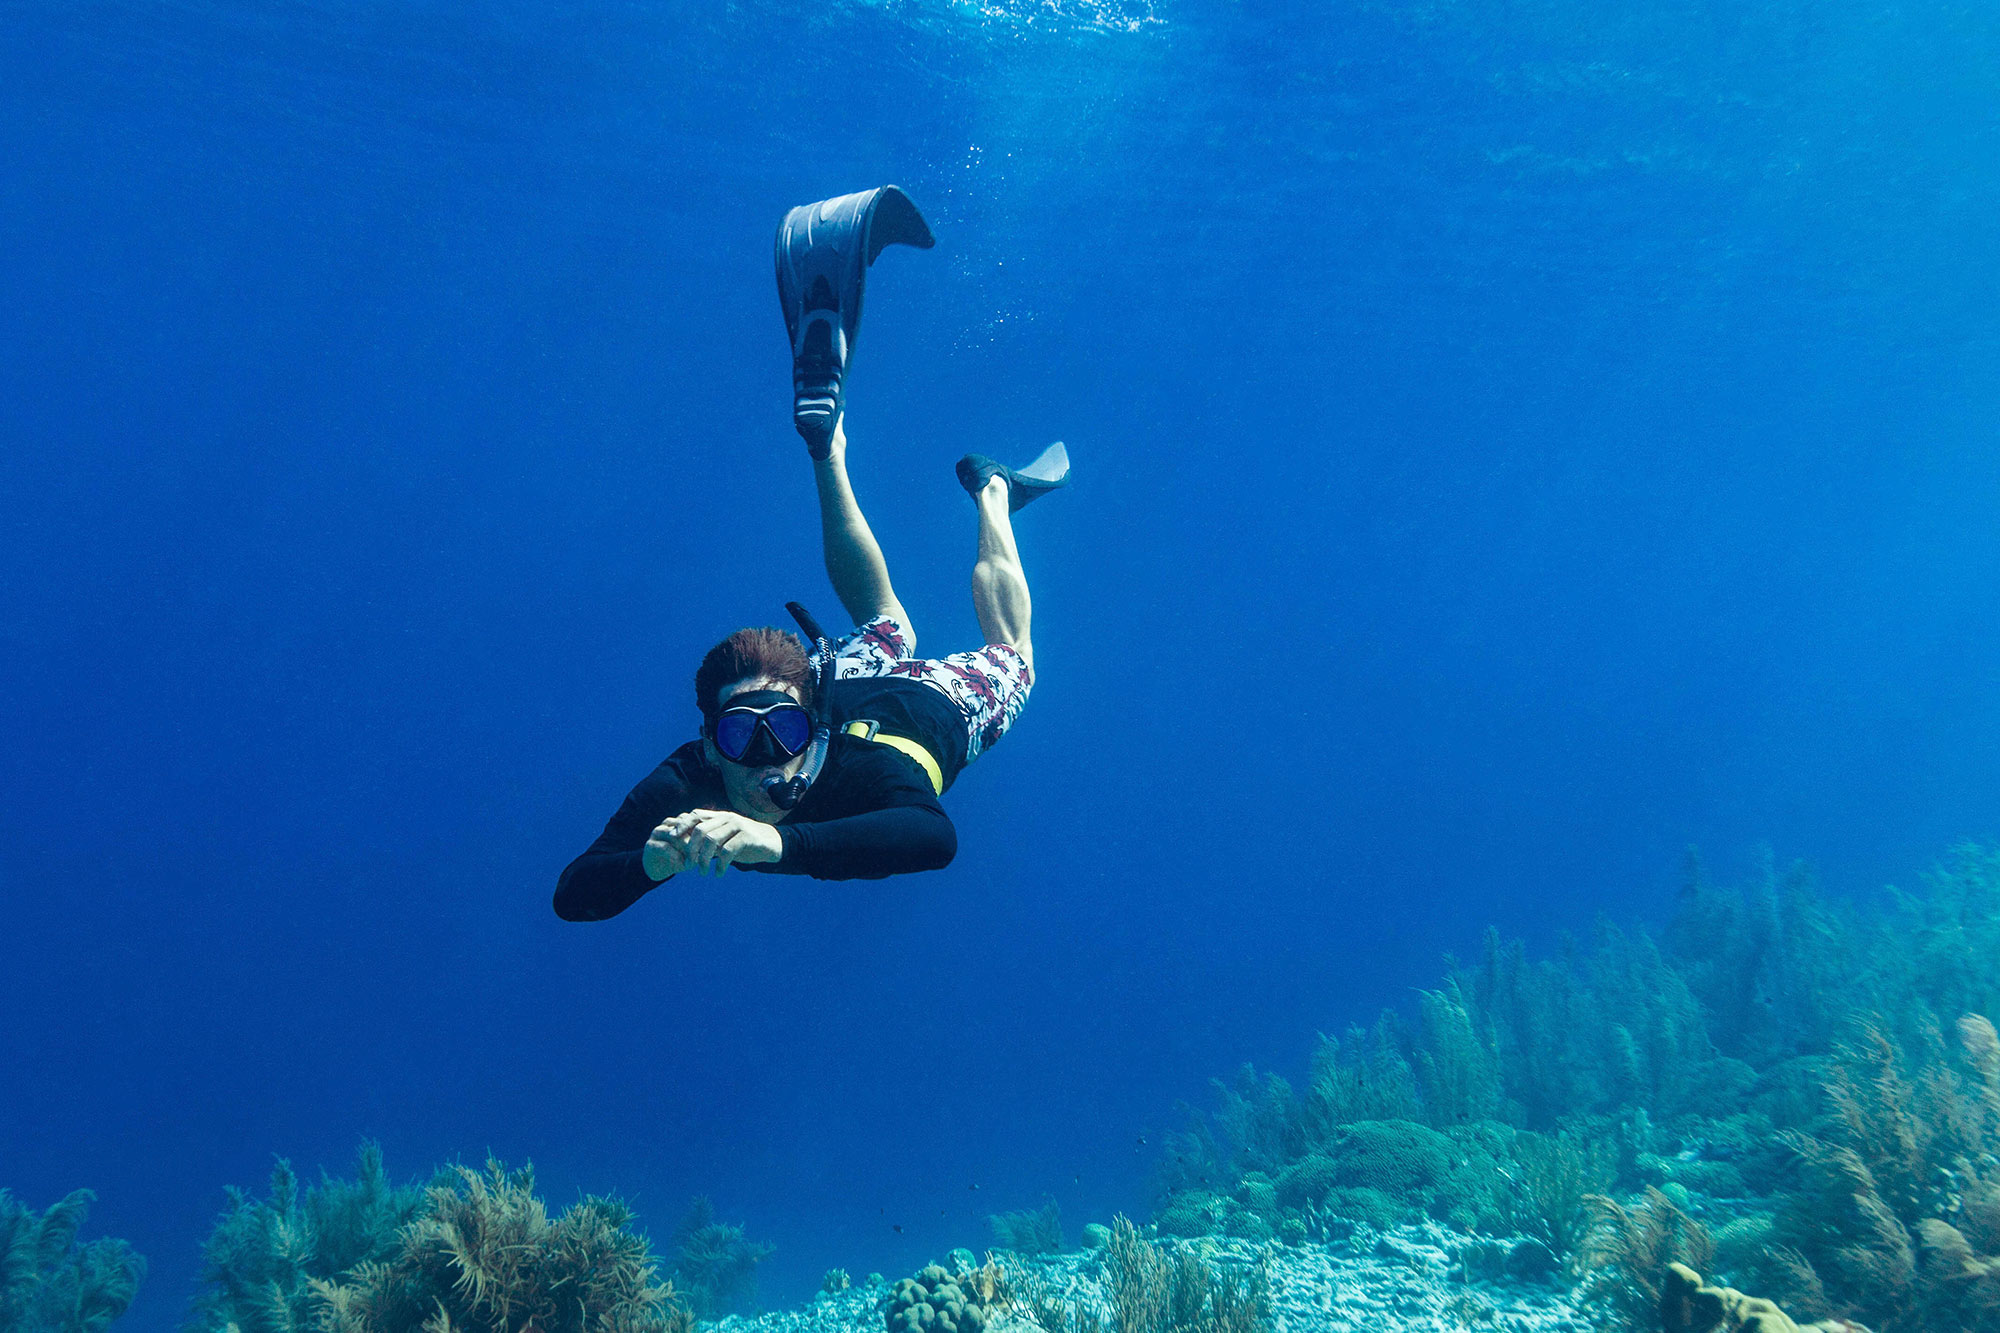 Joey Diving Down Underwater With His Snorkeling Equipment In Bonaire, Dutch Caribbean